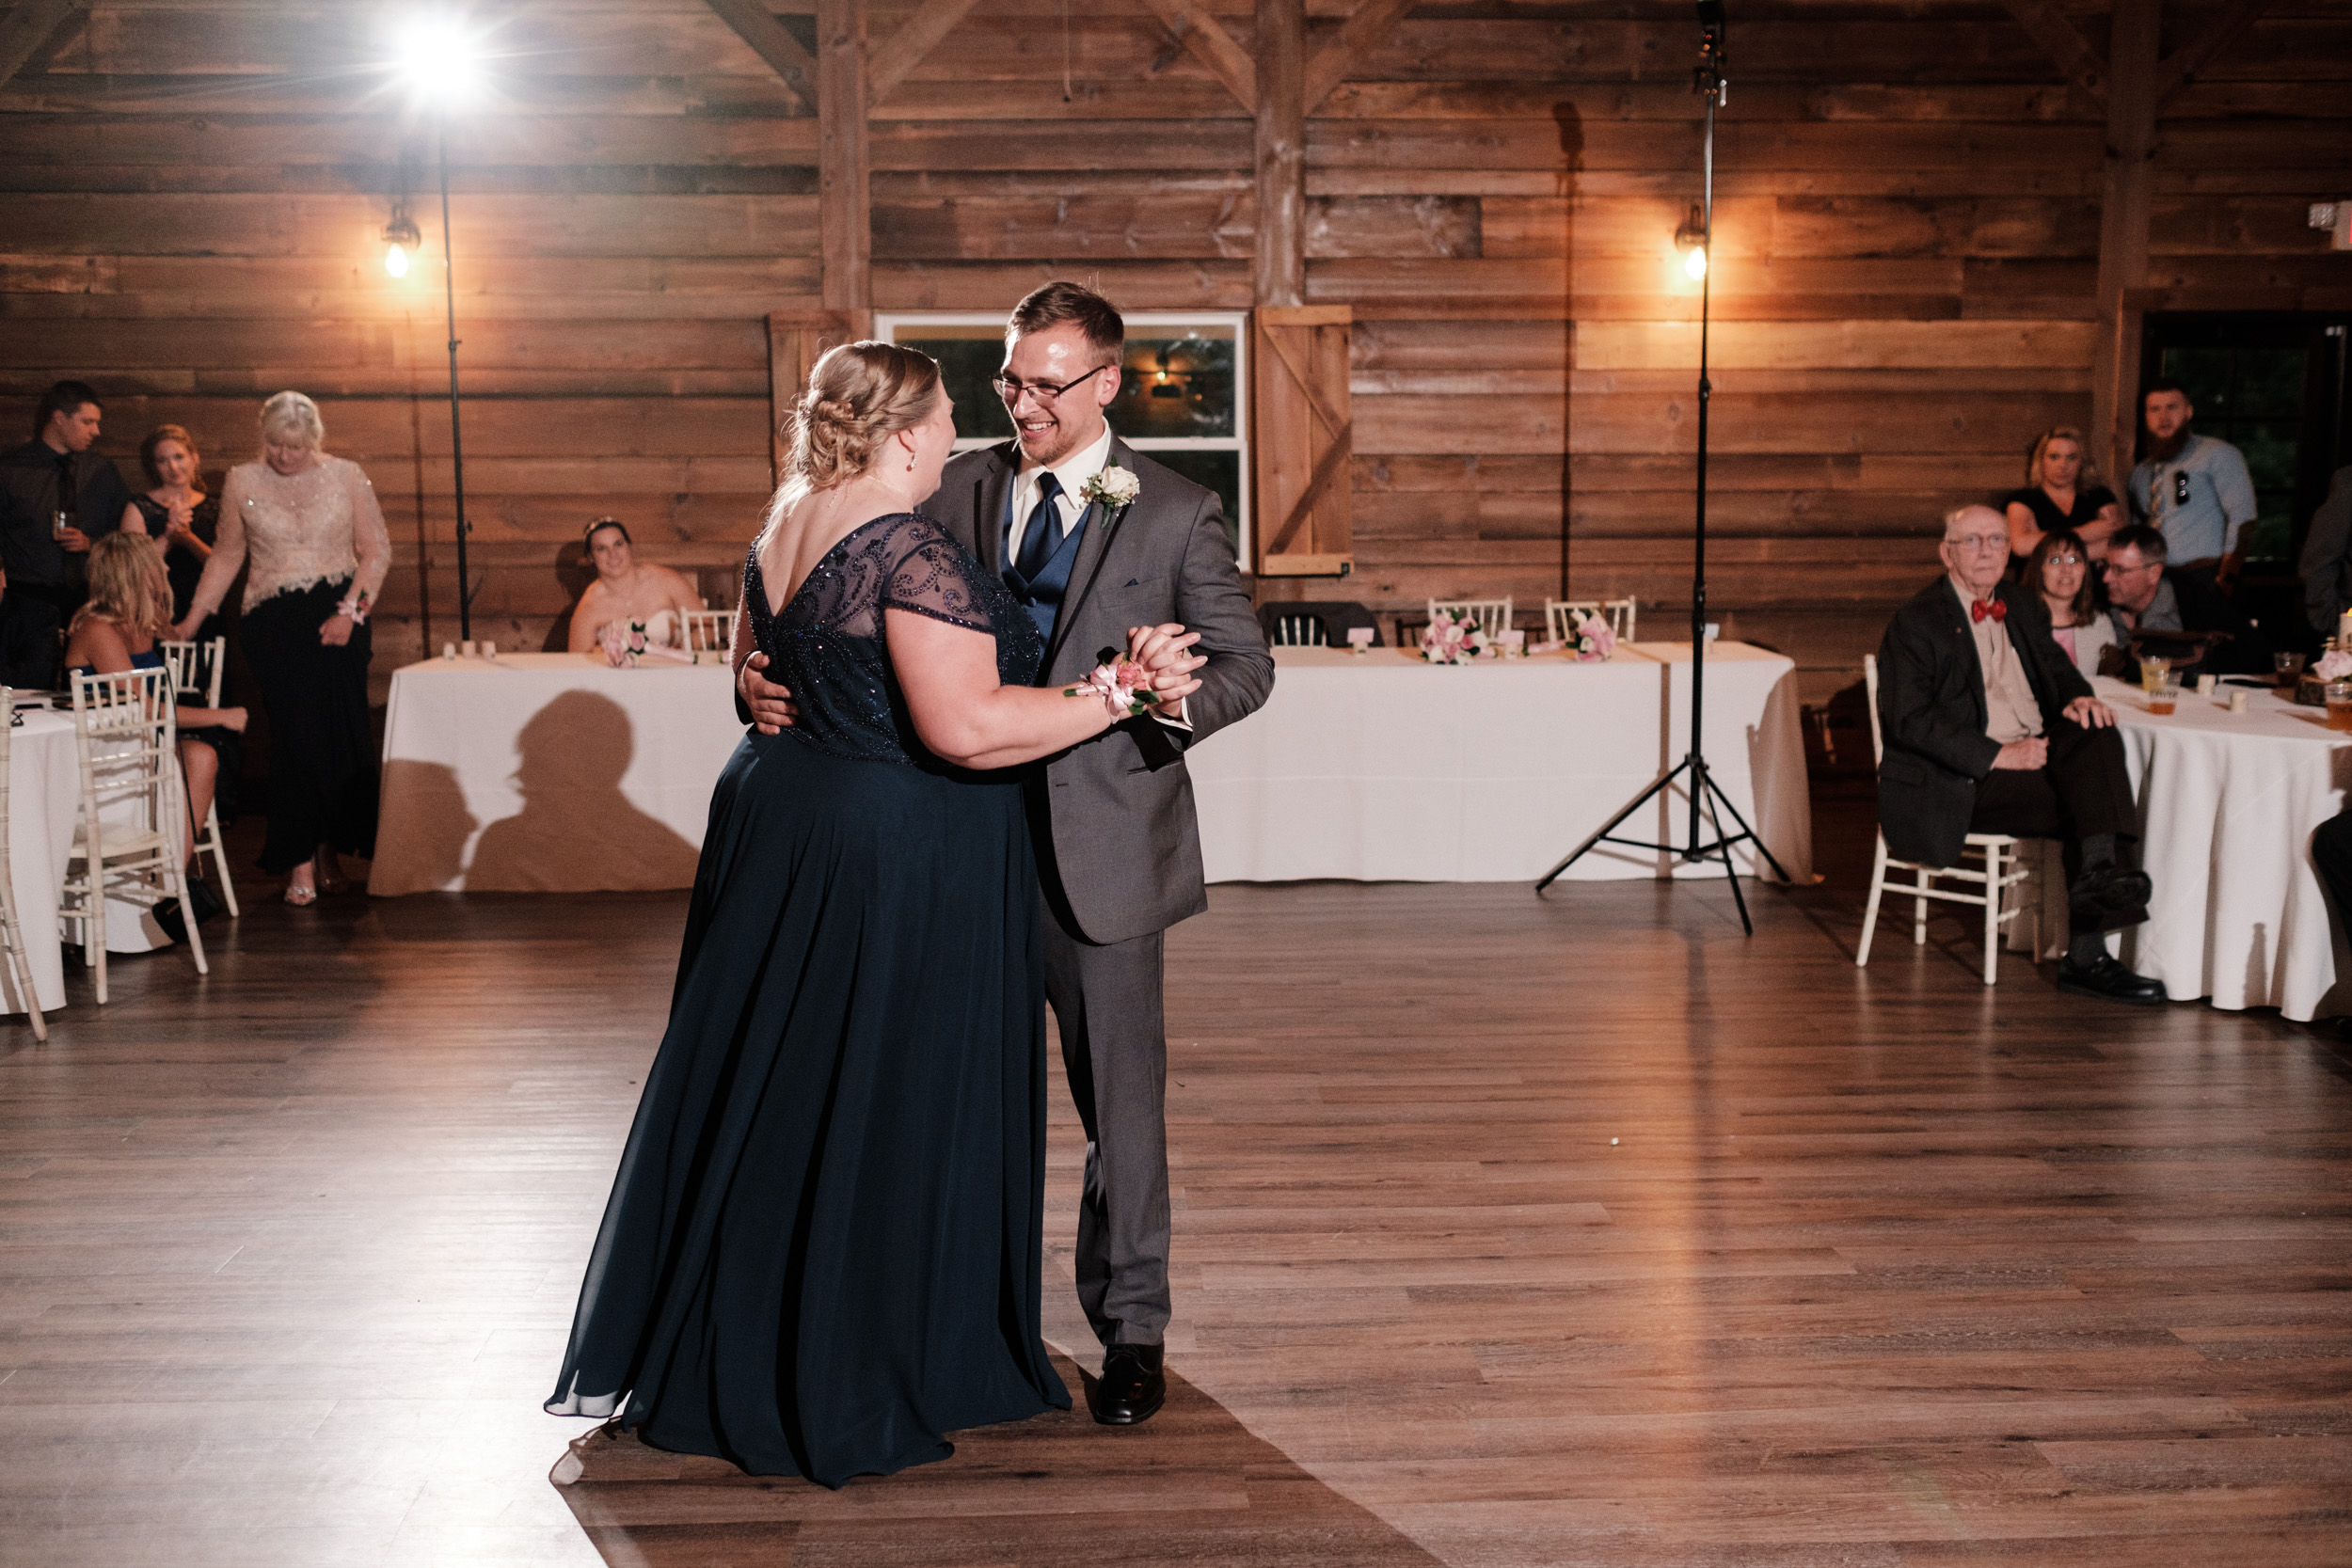 19-06-22-Ryan-Katie-The-Fields-Reserve-Wedding-80.jpg